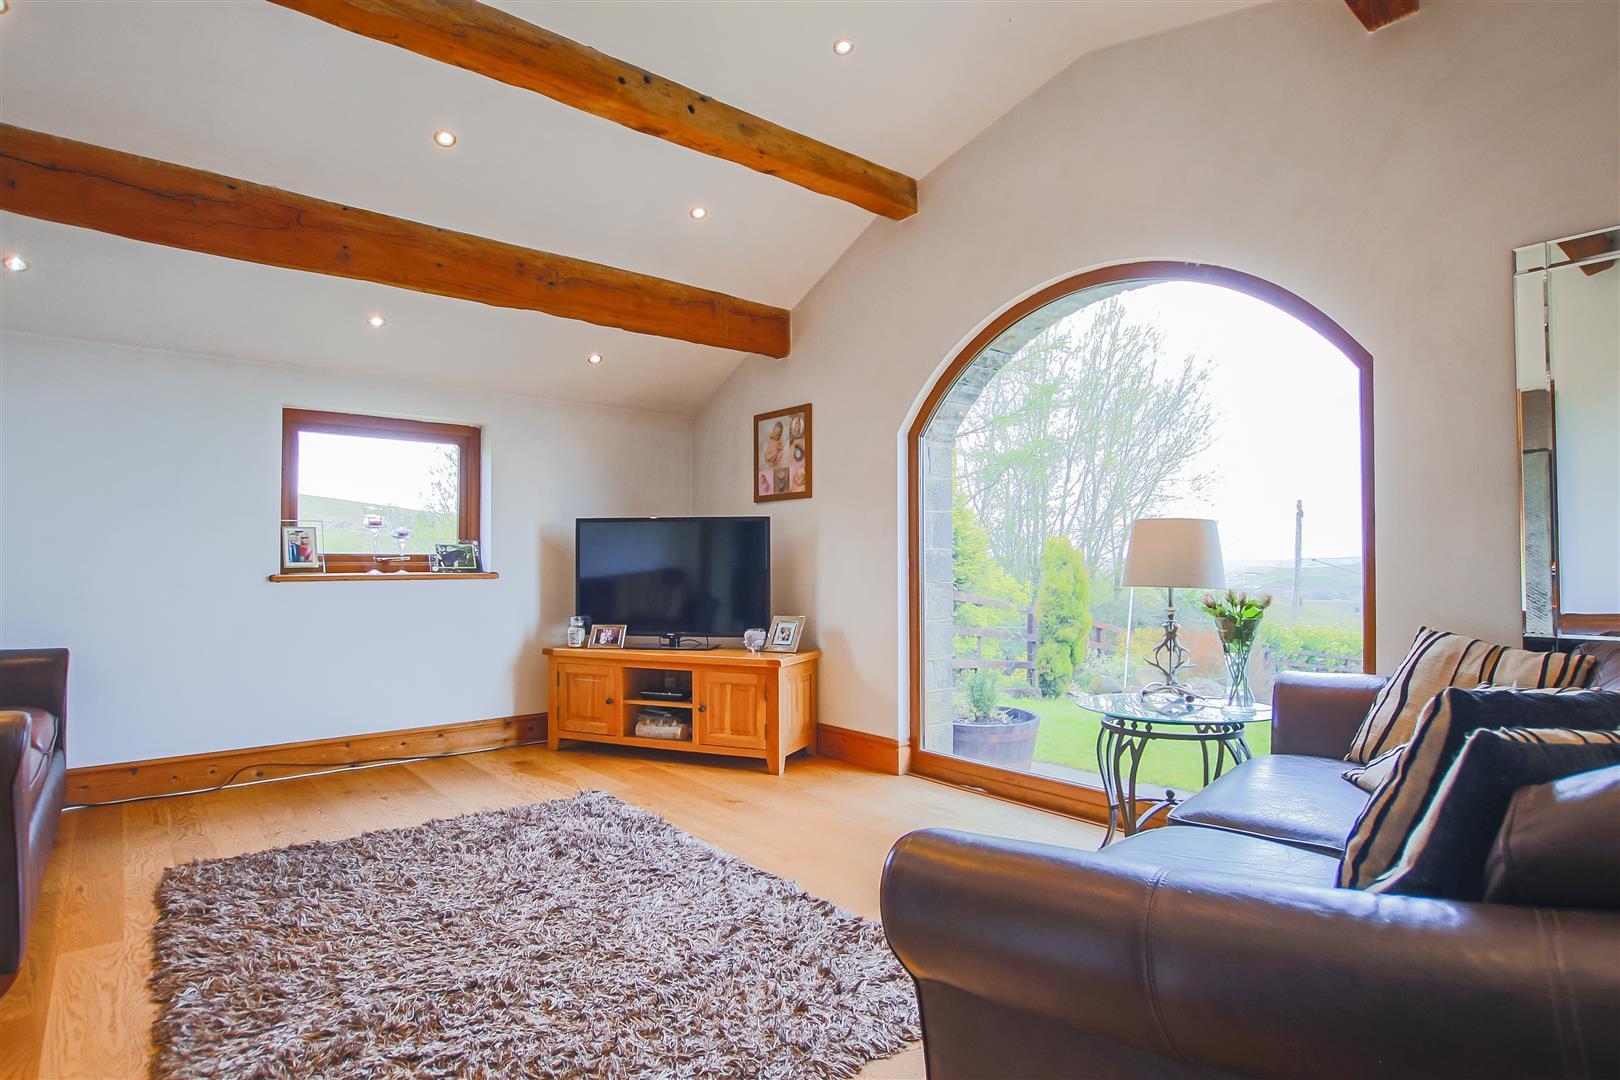 4 Bedroom Semi-detached House For Sale - Image 2